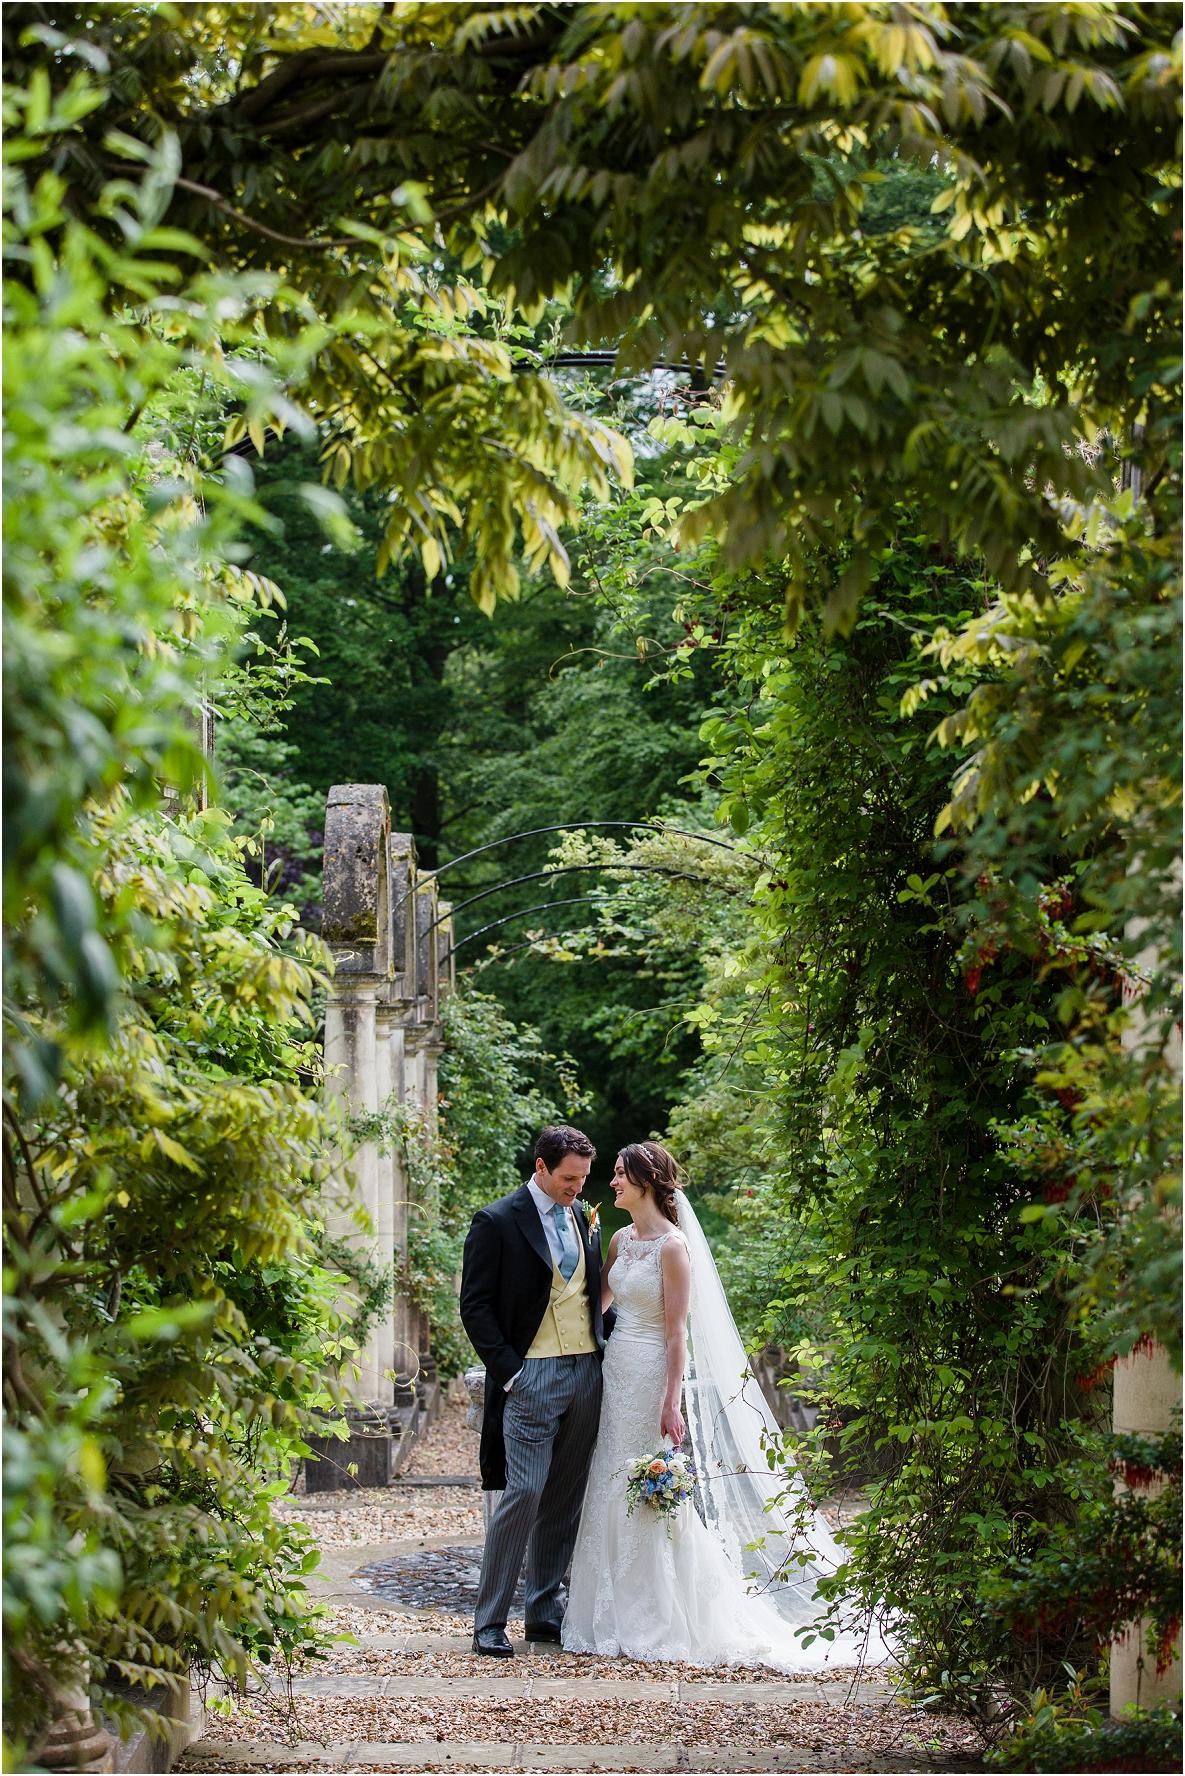 Military Wedding at The Orangery Settrington